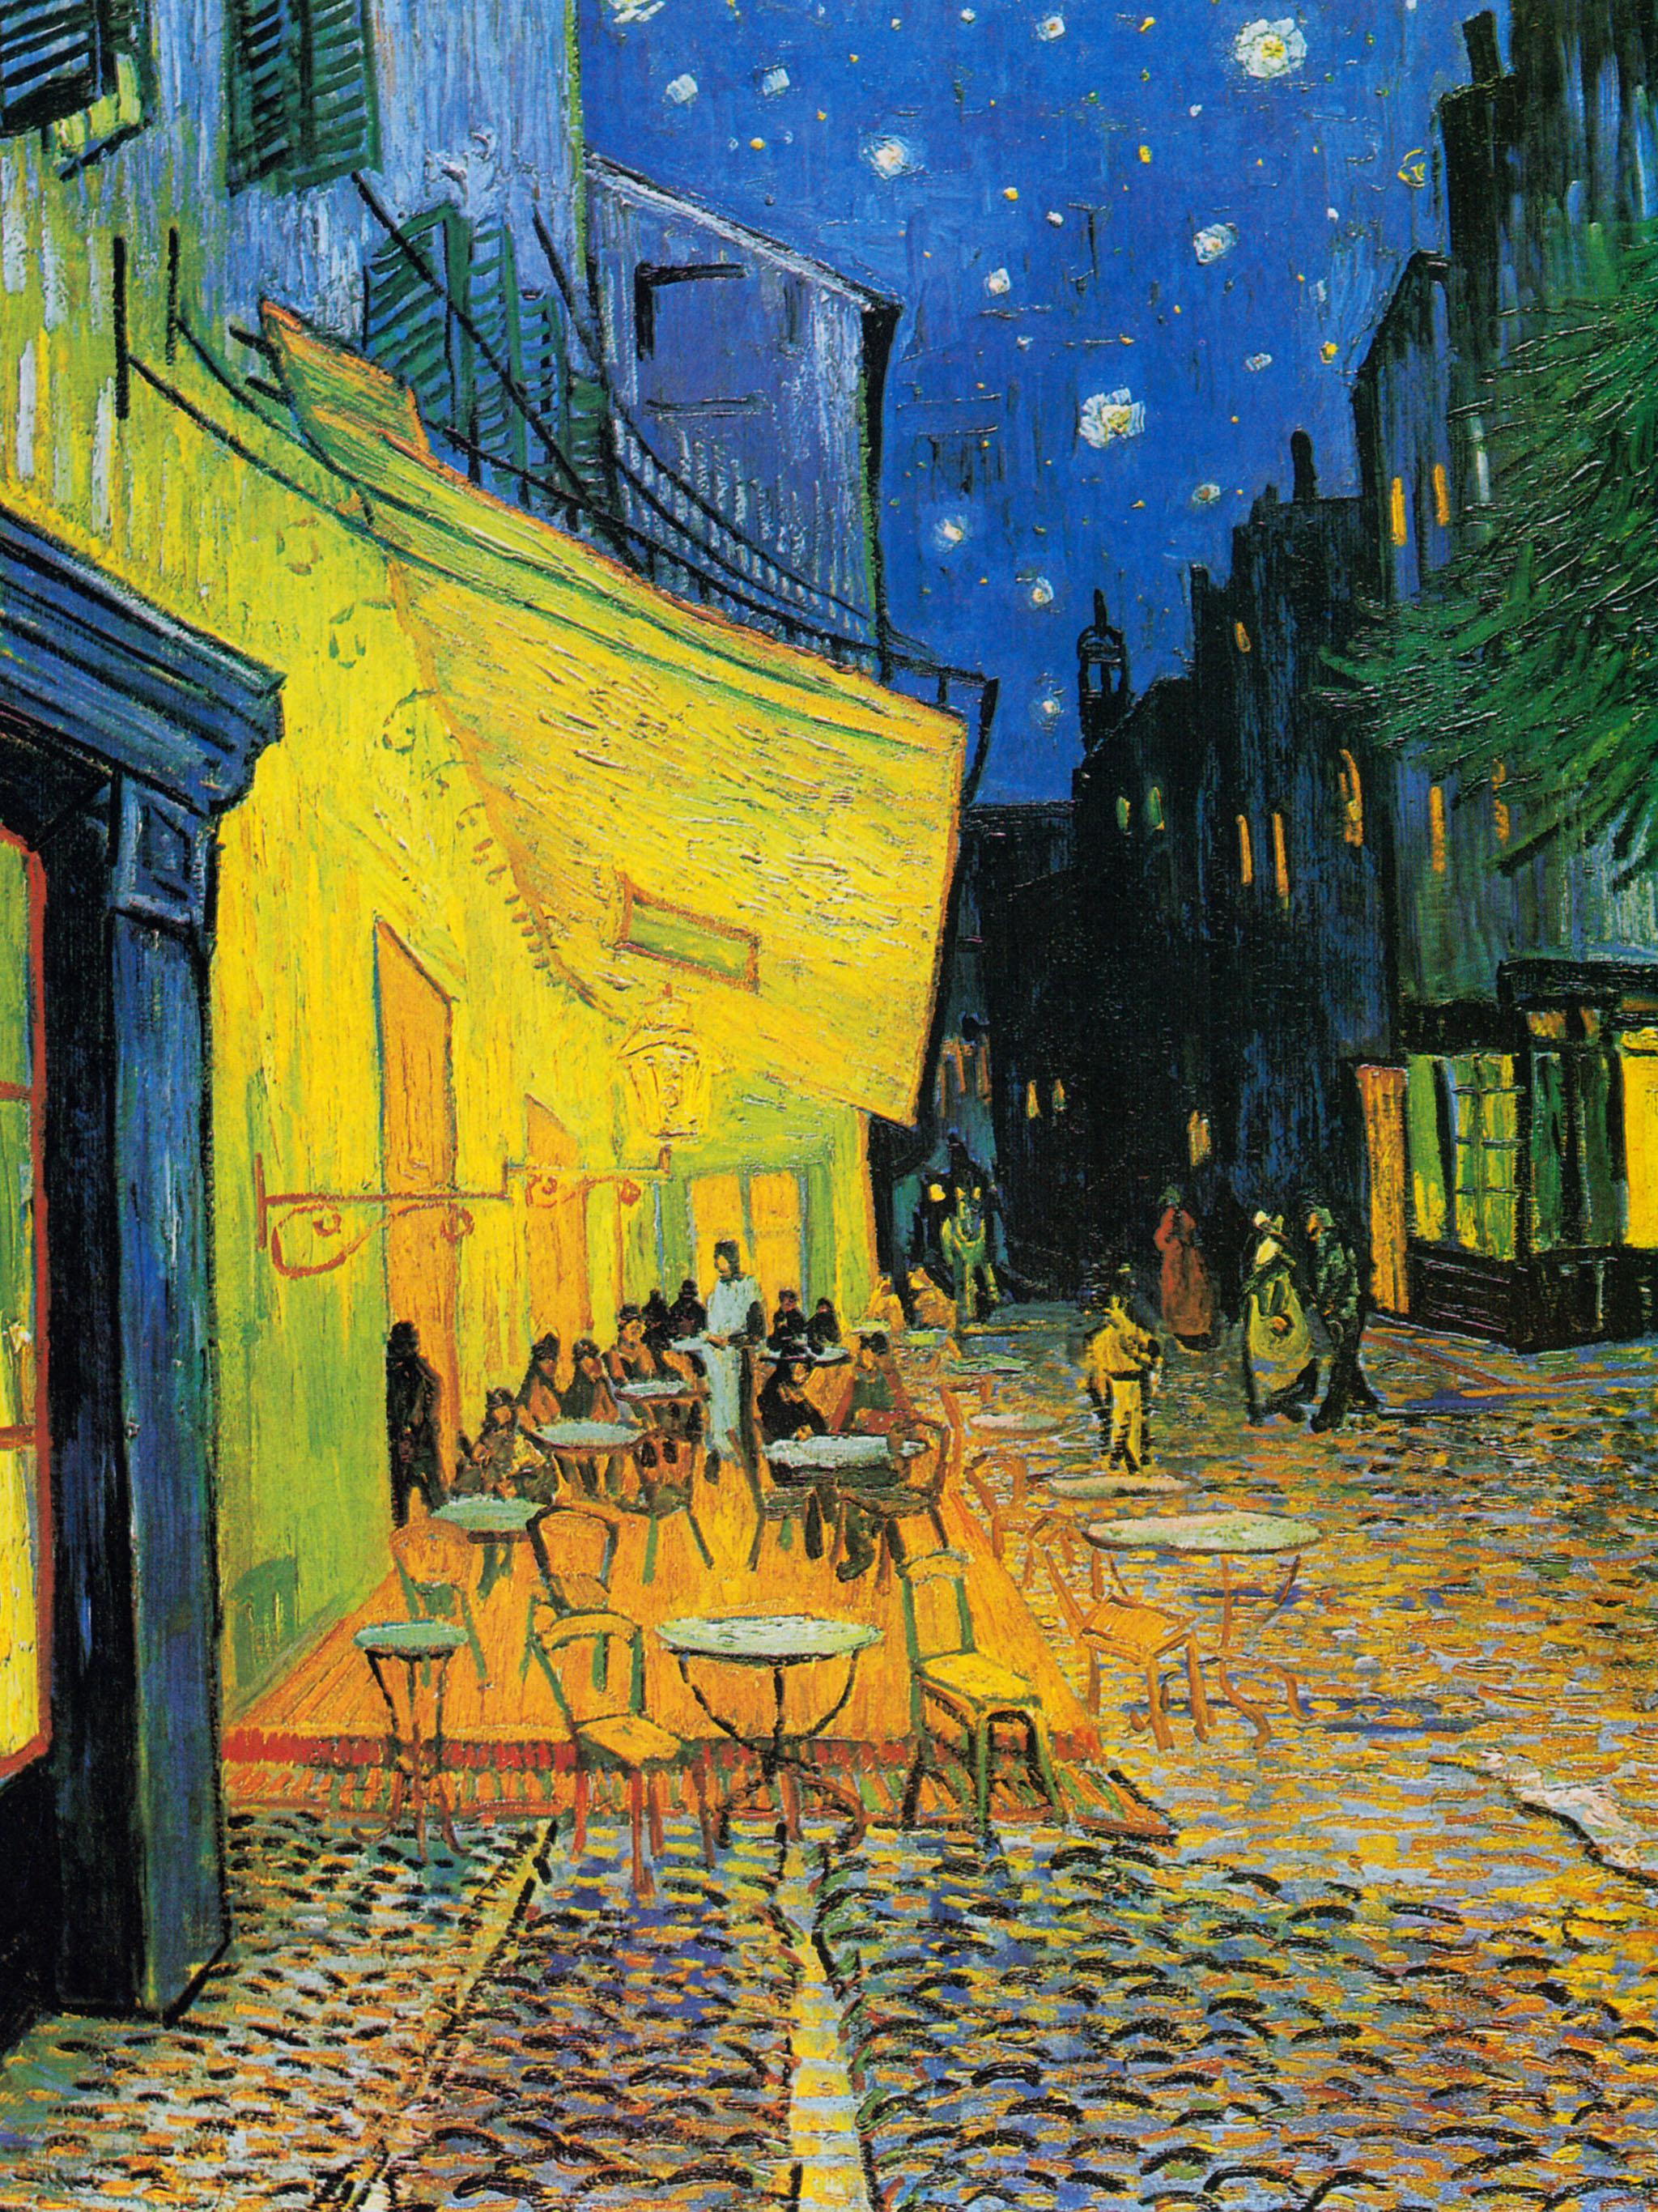 Vincent van Gogh – Cafe Terrace at Night 2048x2732